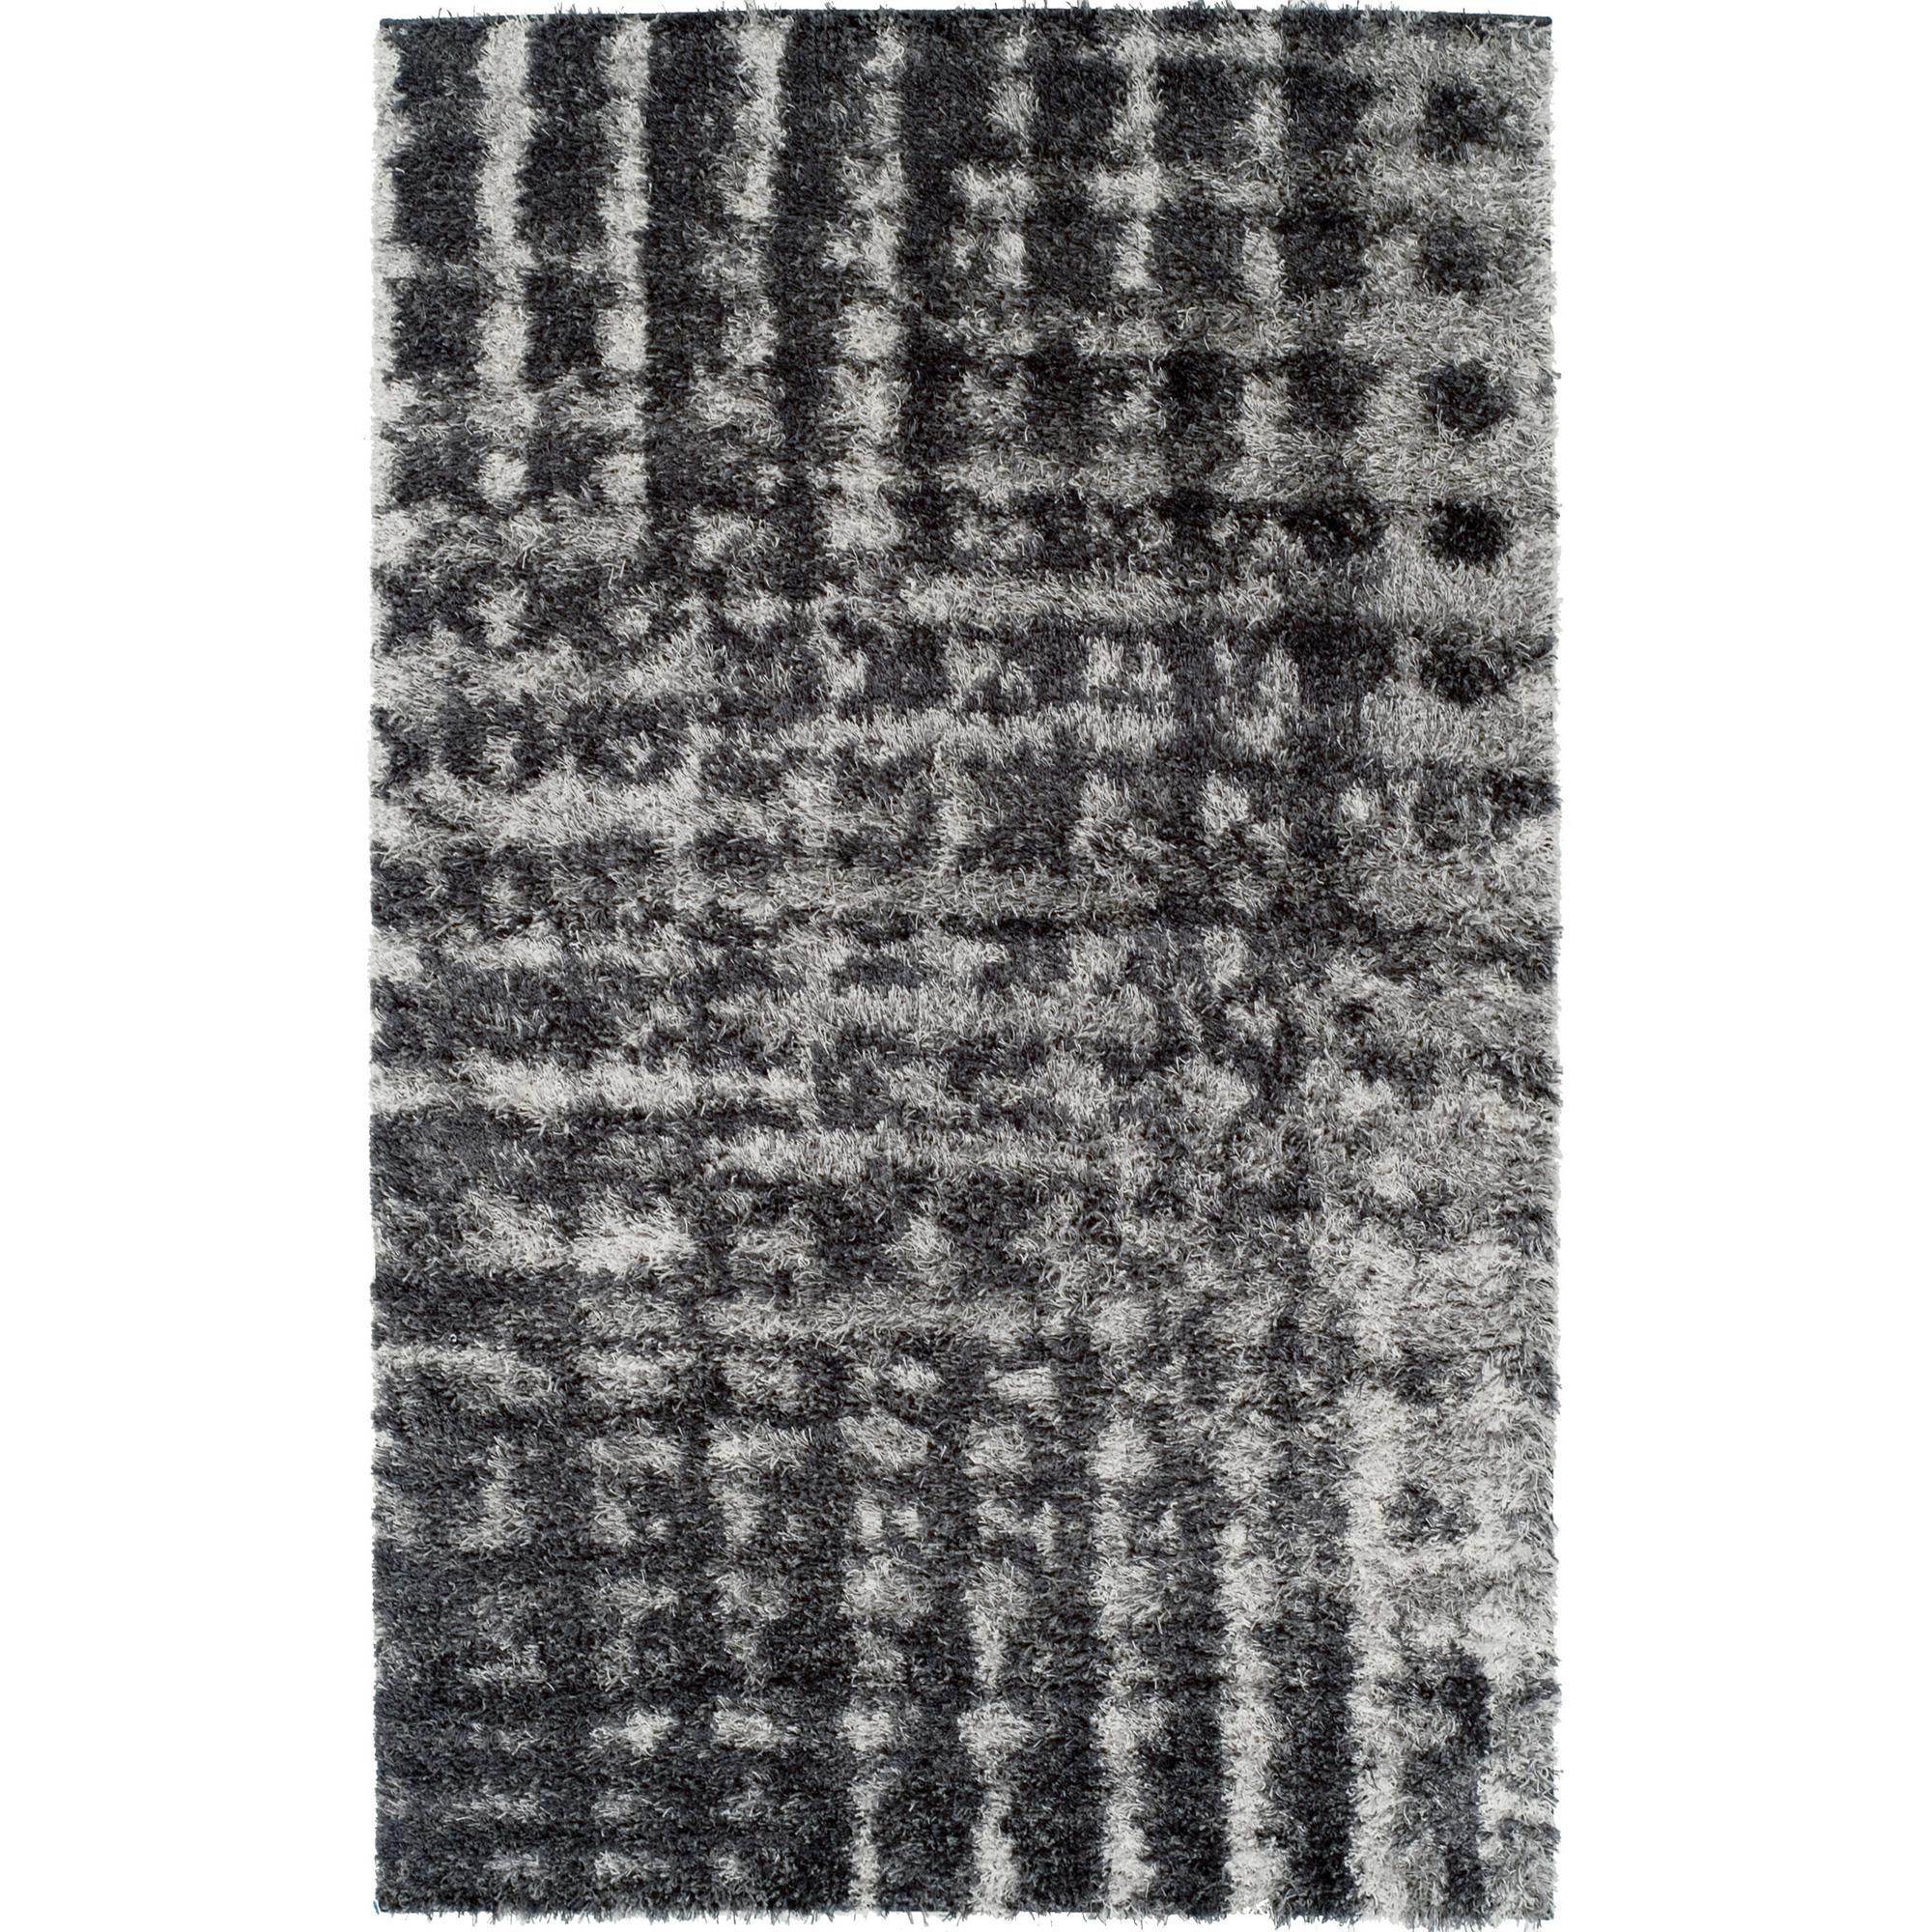 Dalyn Rug Company | Arturro Ash 8x10 Area Rug